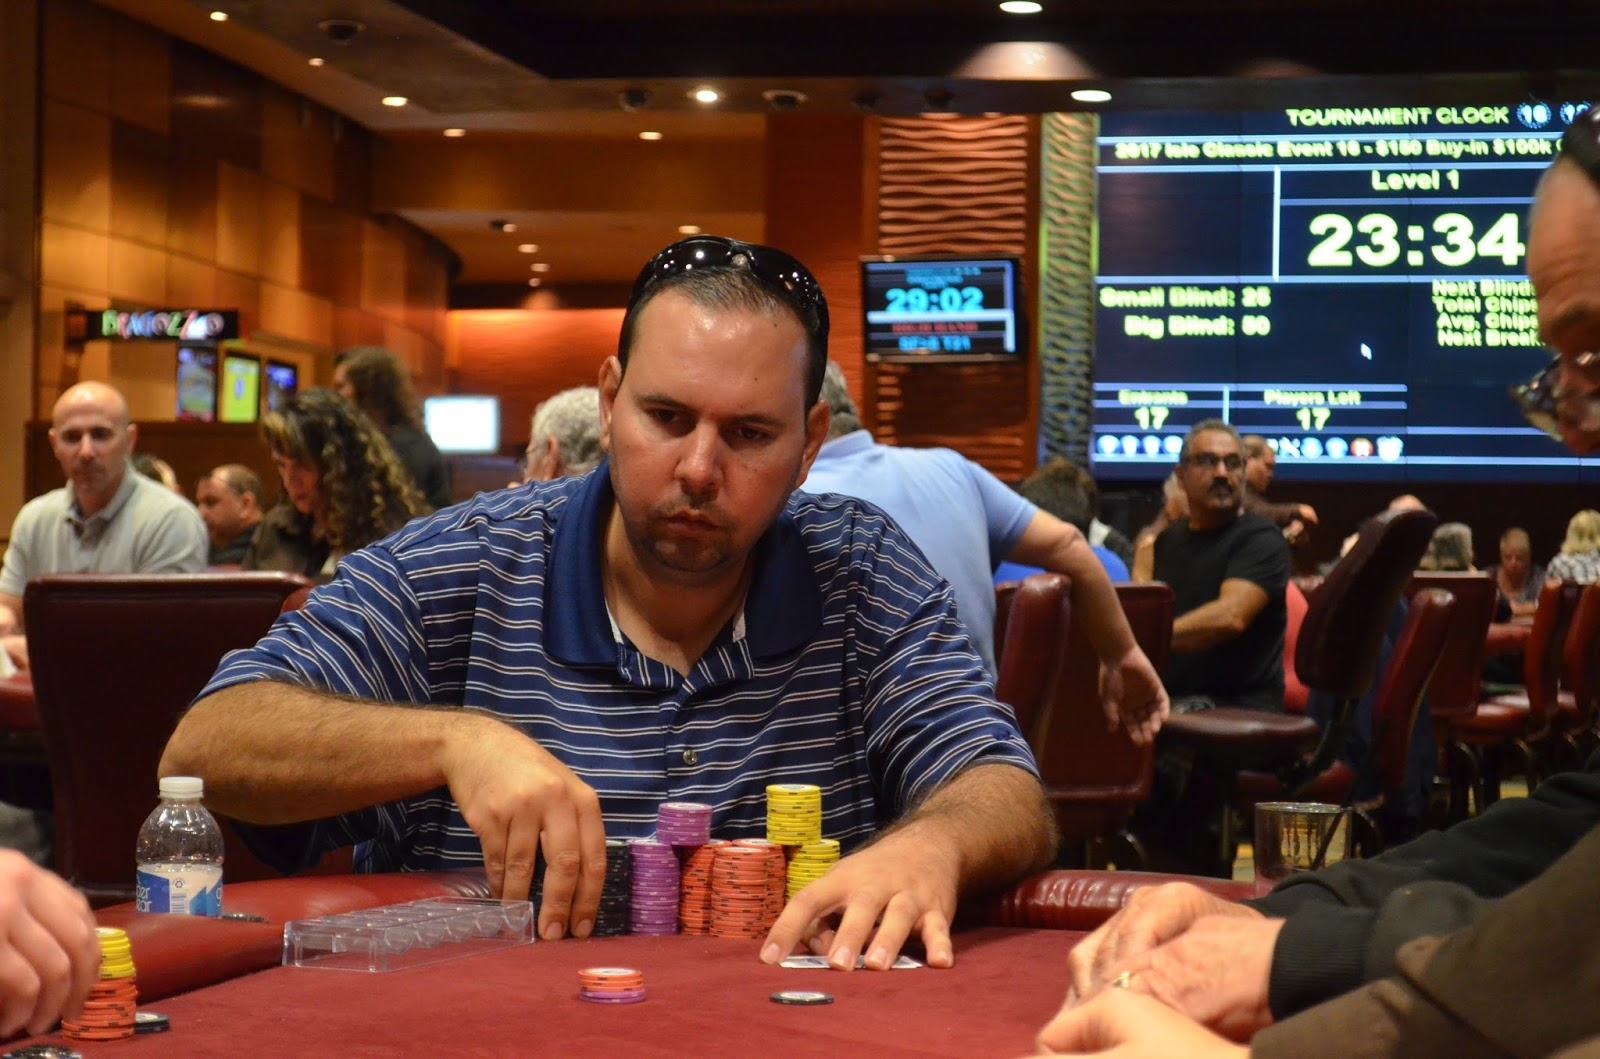 Poker tournaments west palm beach fl where is the iphone 5 sim card slot